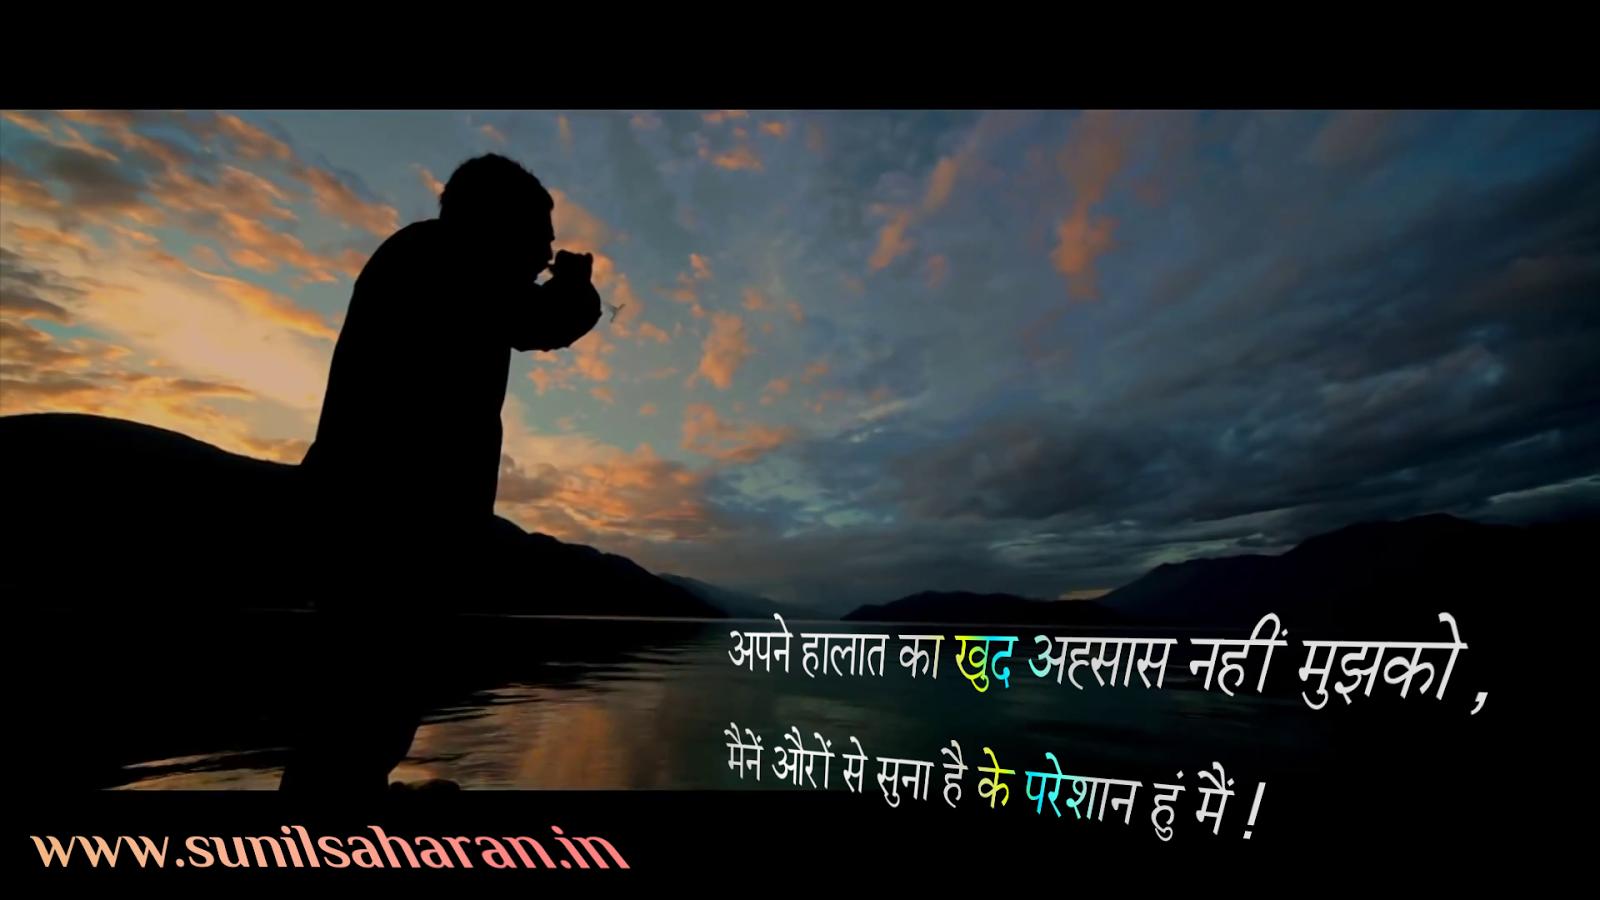 Hindi Sad Quotes For Boys Hindi Sad Quotes About Love